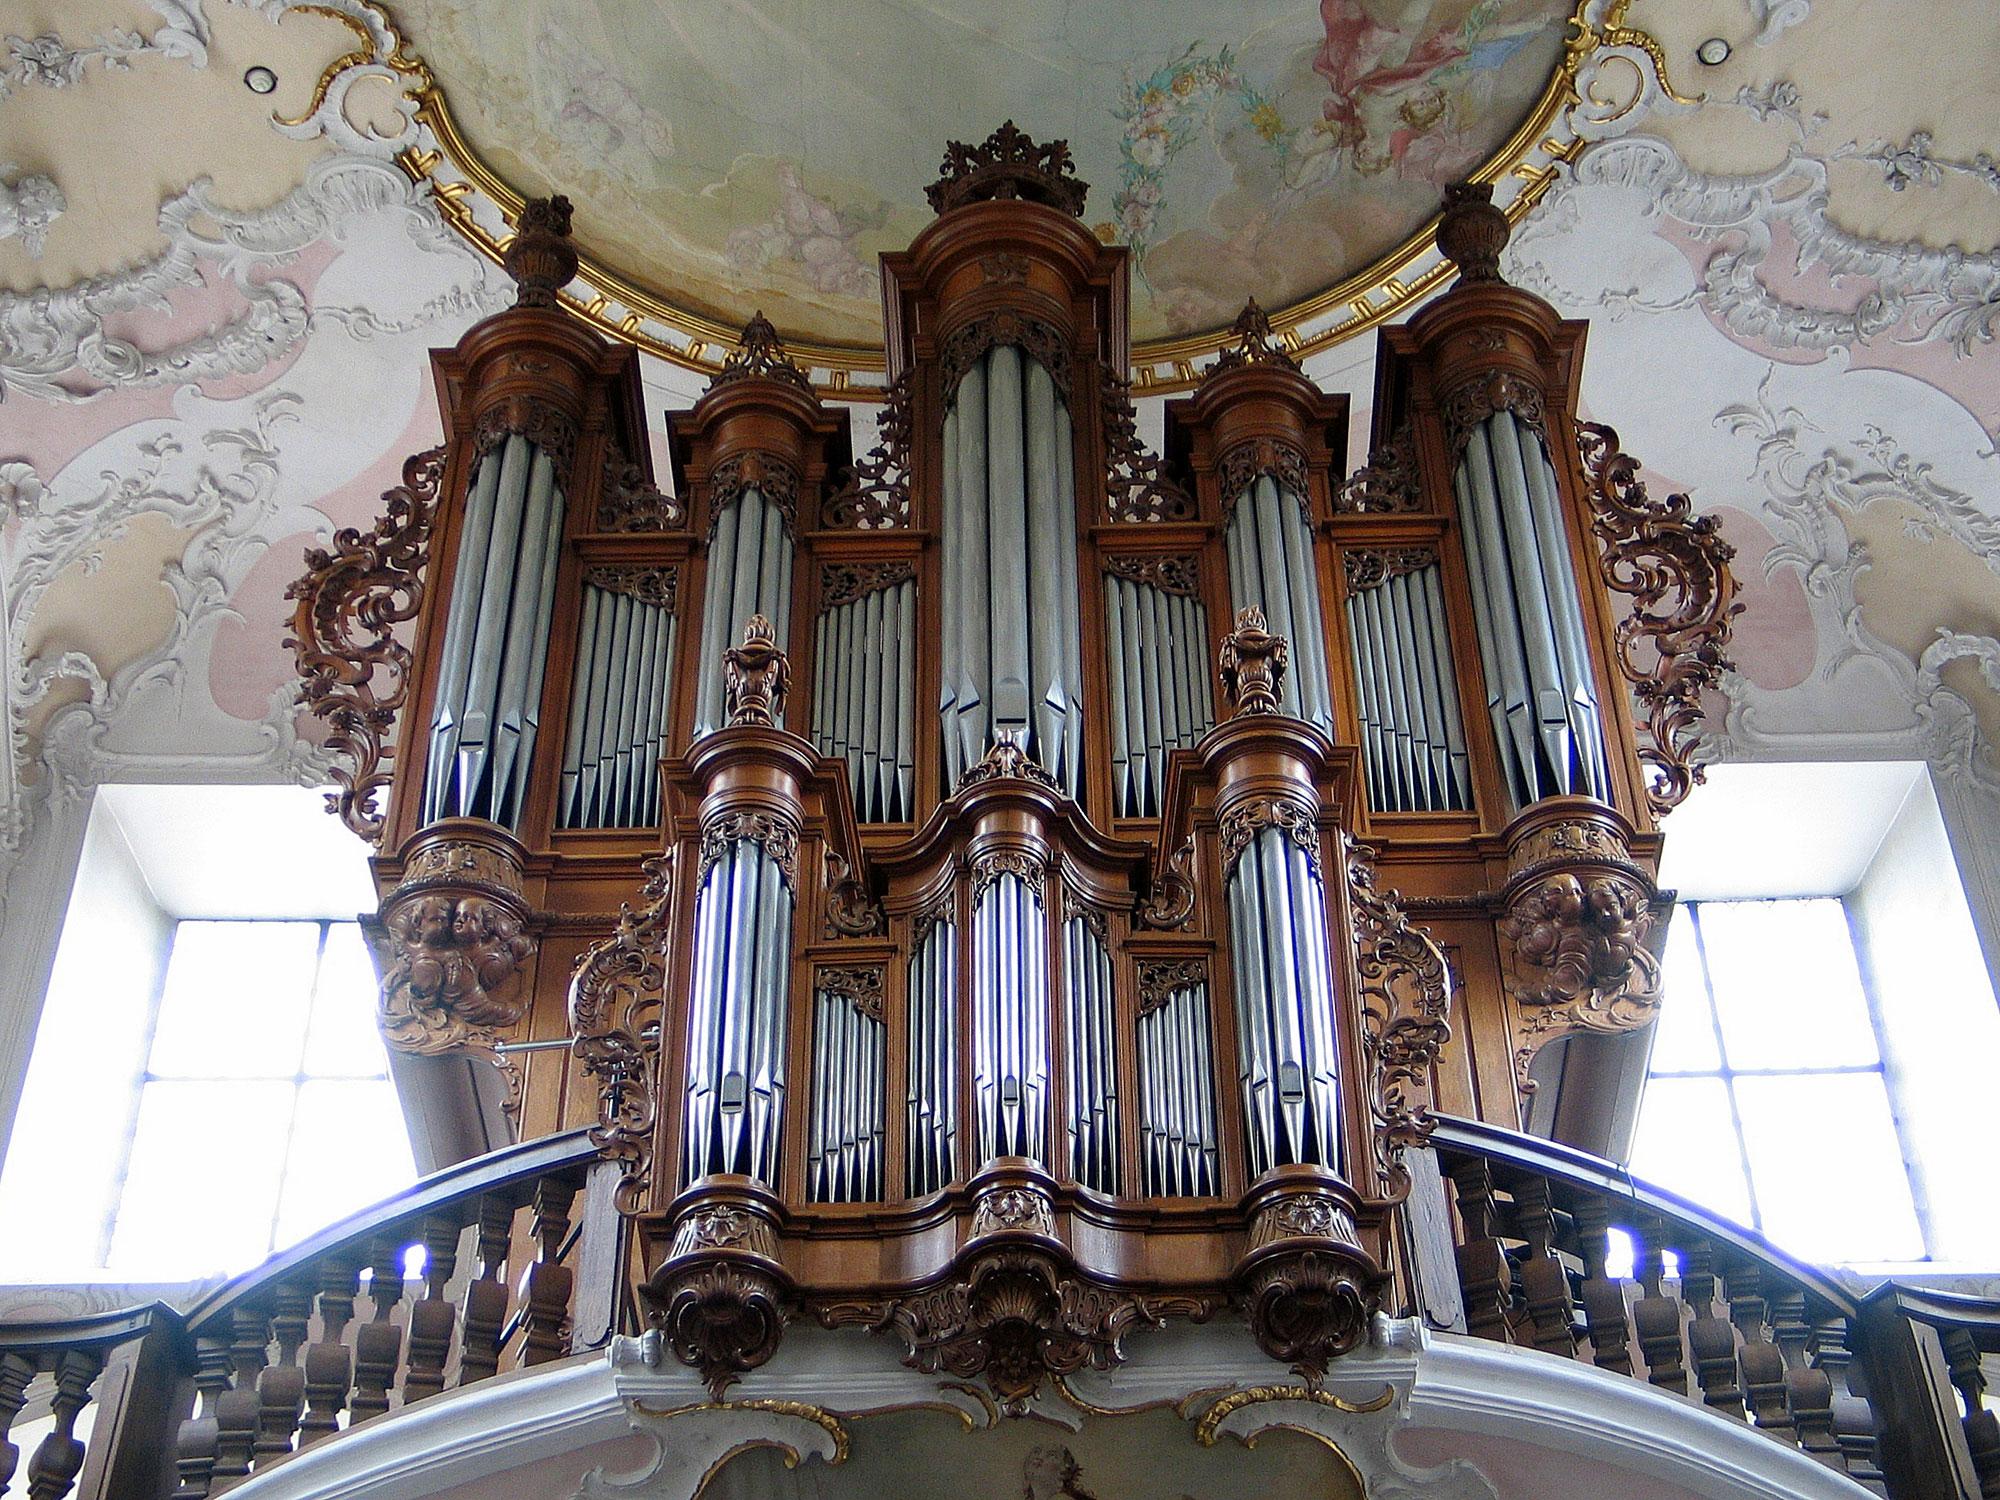 1761 2005 Johann Andreas Silbermann Metzler Organ